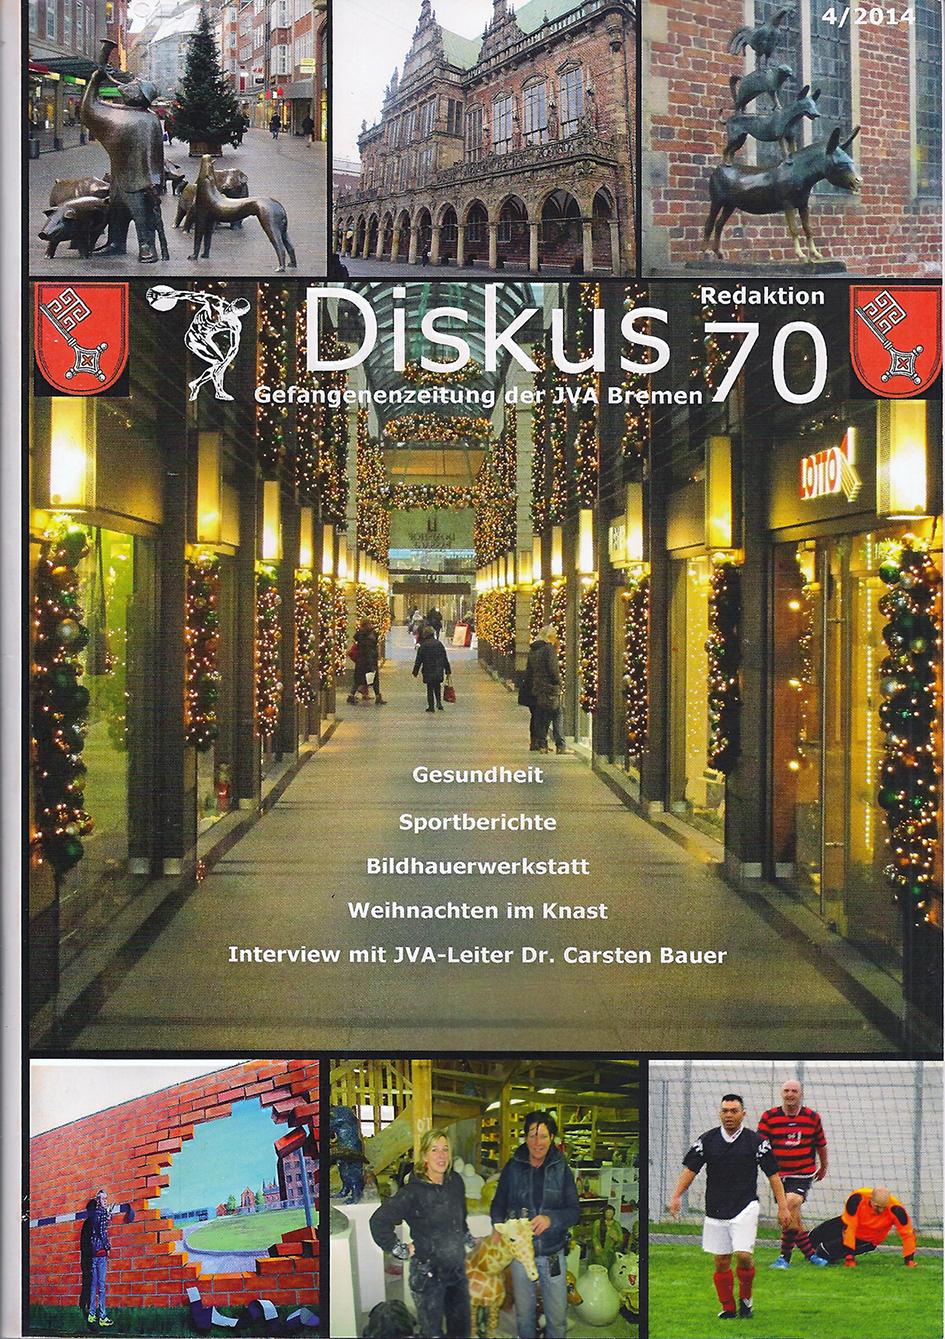 Diskus 70 Knastzeitung Bremen